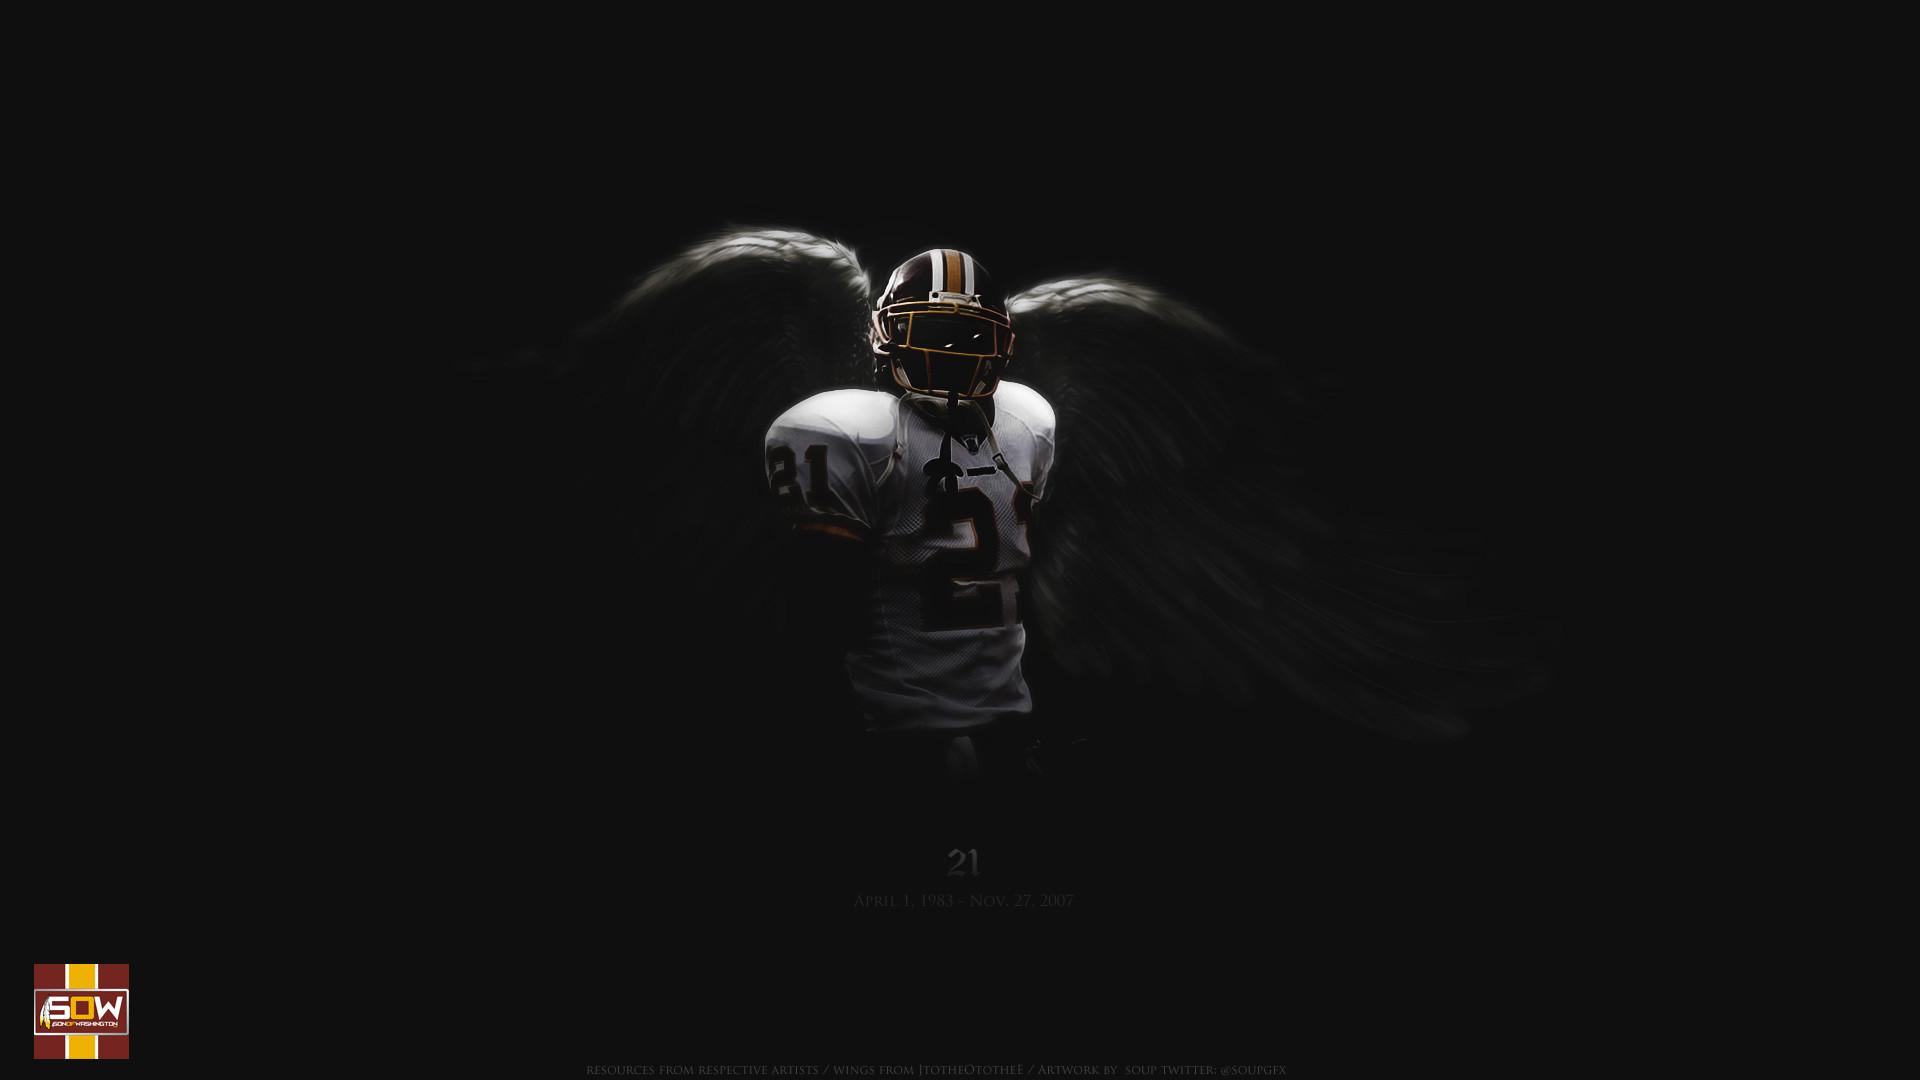 American Football Backgrounds Desktop: Washington Redskins Wallpaper Screensavers (66+ Images